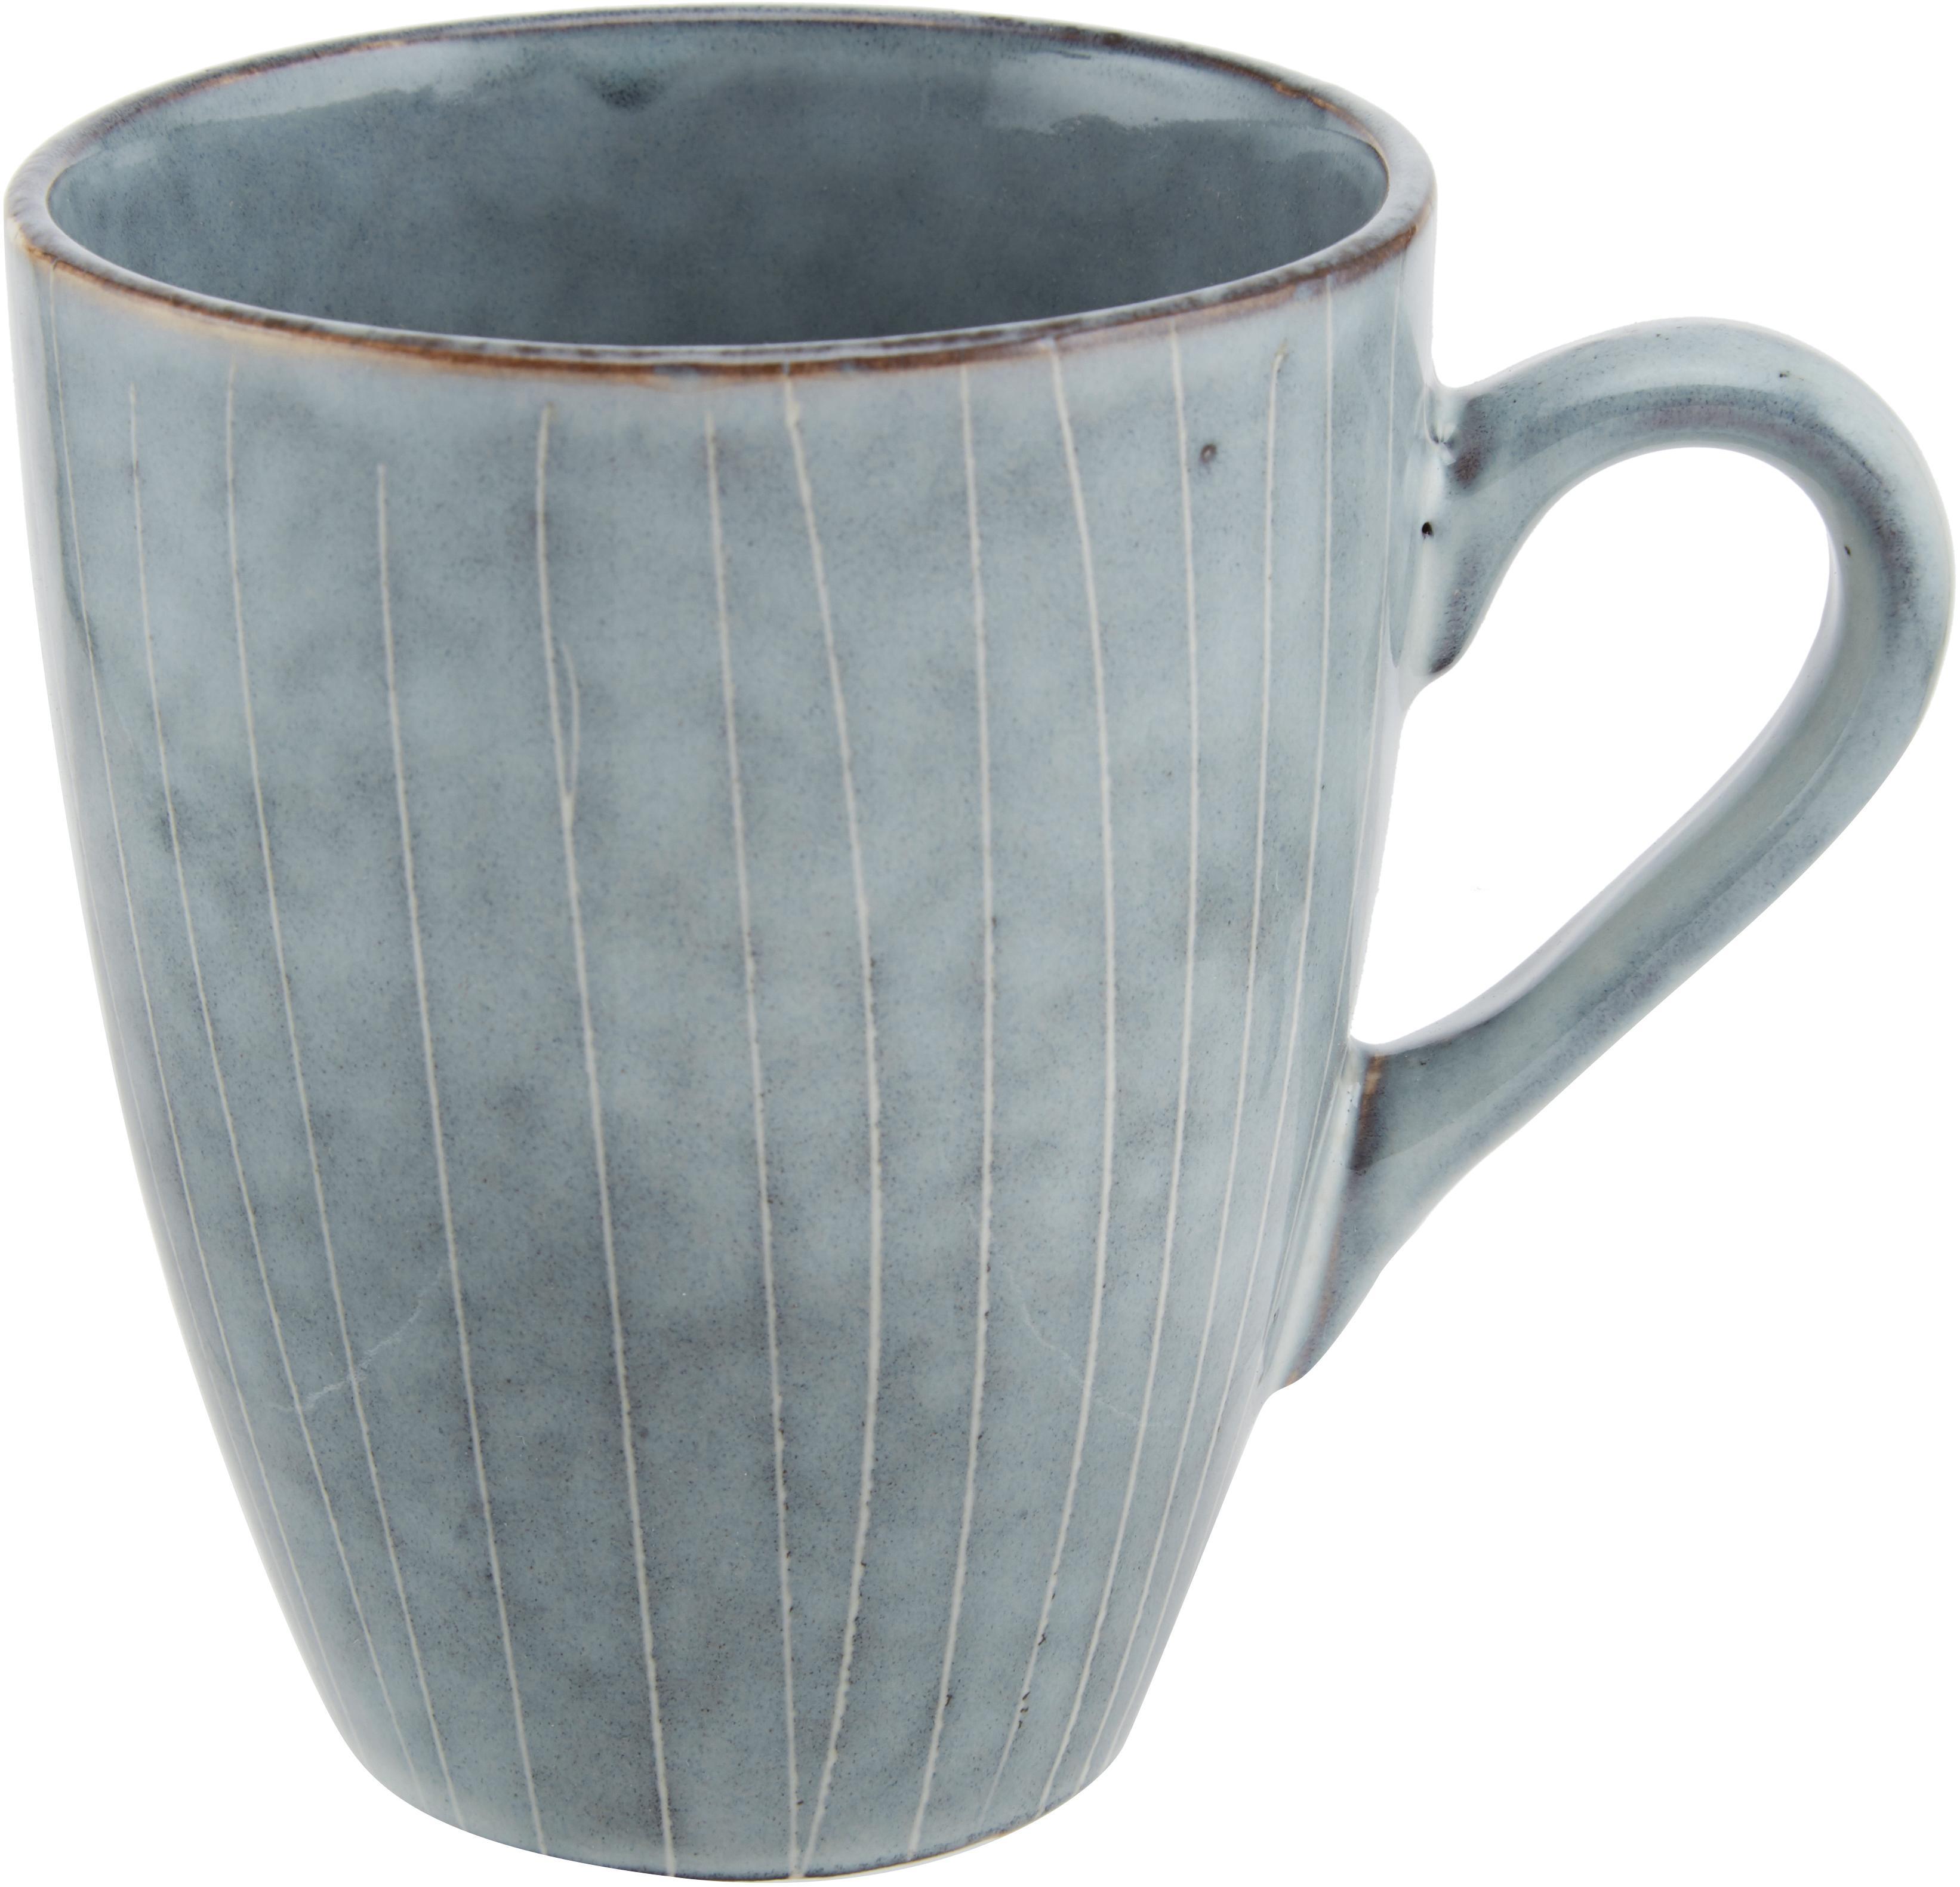 Tazza in terracotta fatta a mano Nordic Sea 6 pz, Terracotta, Grigio e tonalità blu, Ø 10 x Alt. 12 cm